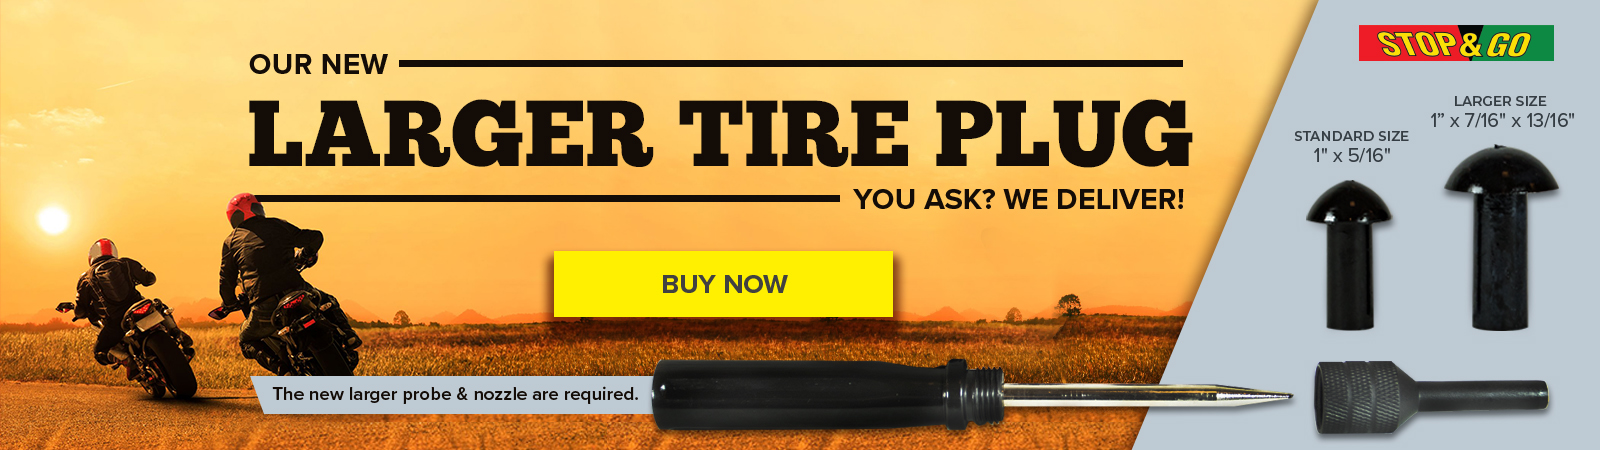 Larger Tire Plug